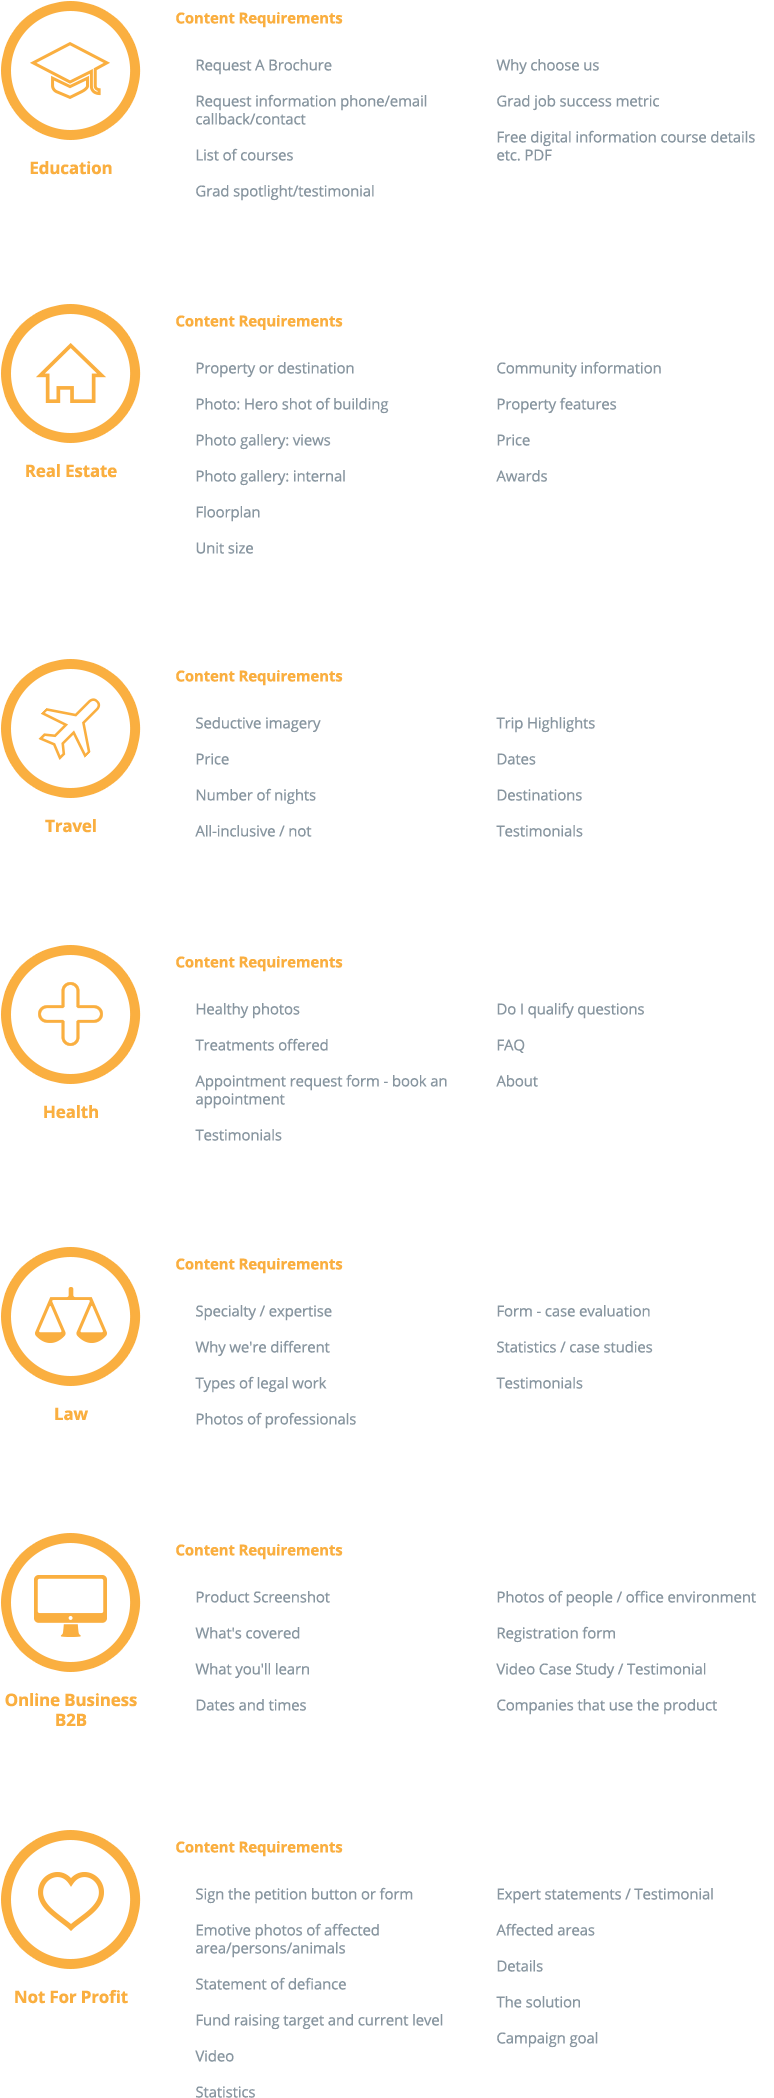 unbounce-templates-industry-matrix